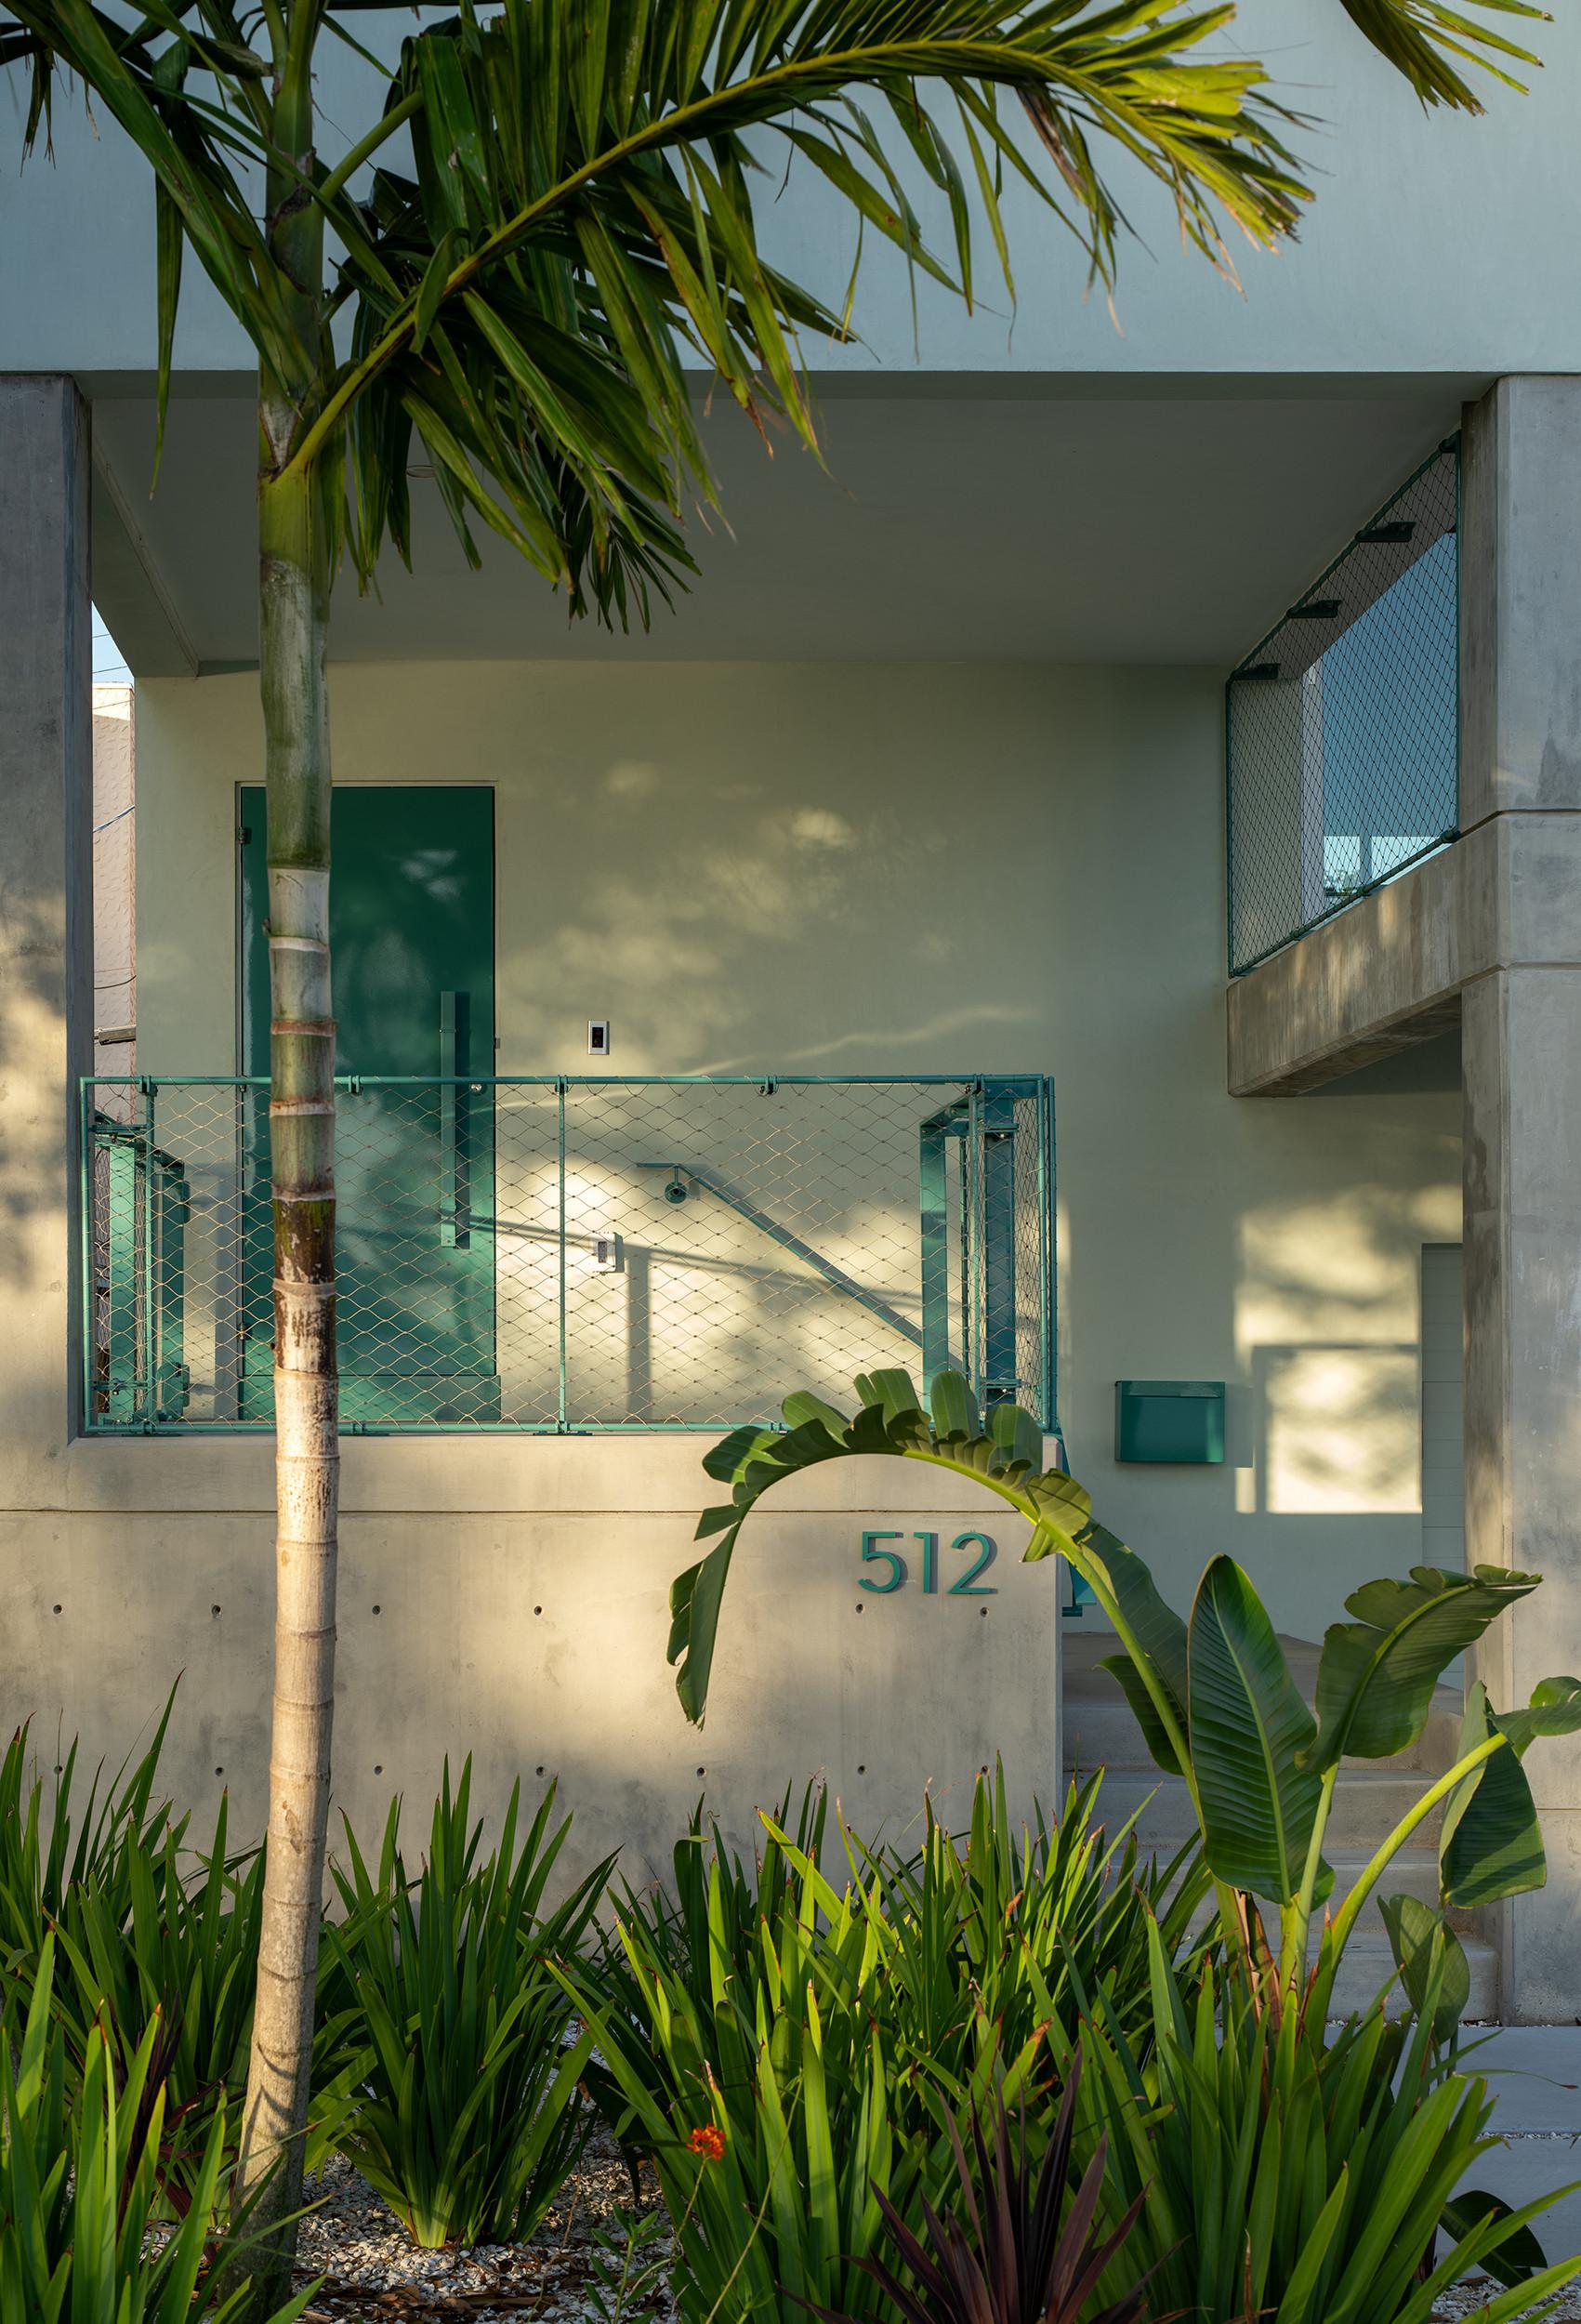 512 House